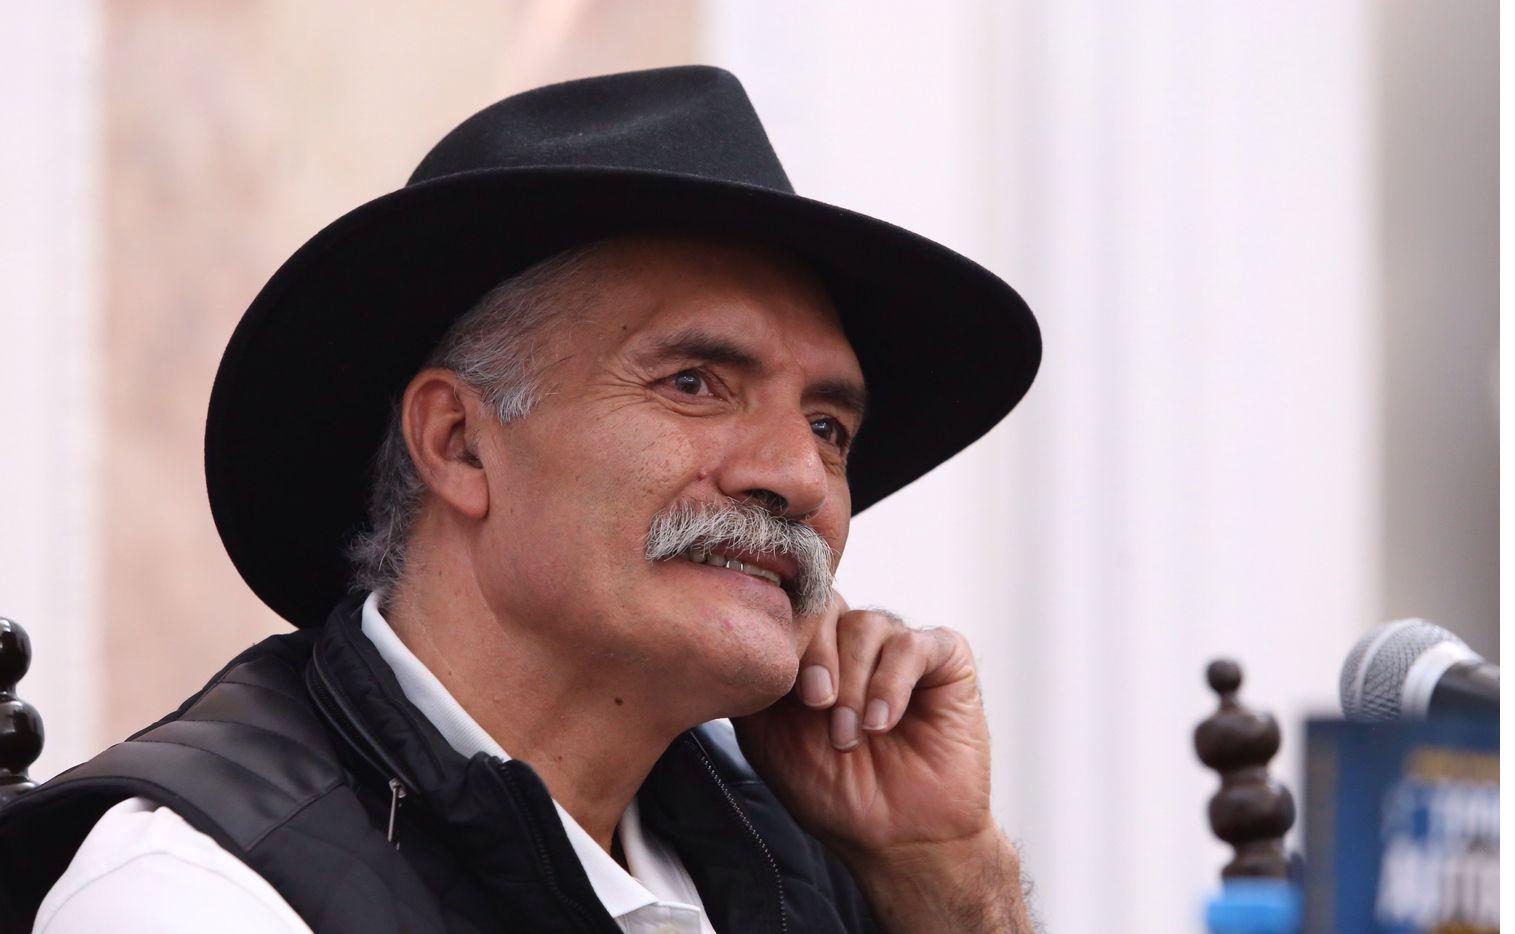 El ex líder autodefensa José Manuel Mireles falleció este miércoles en Morelia.